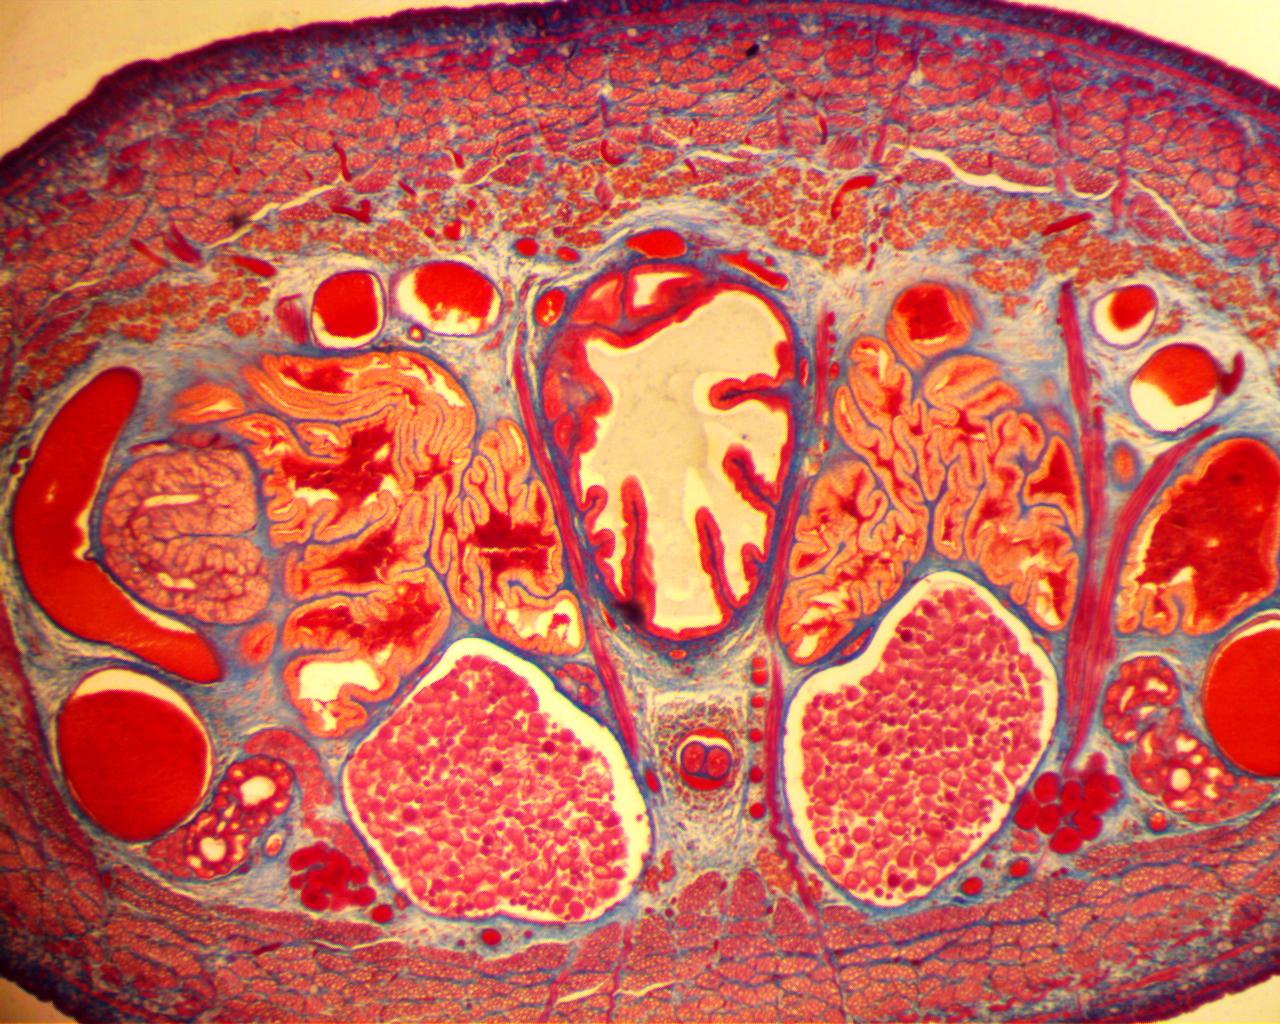 Hirudo medicinalis (Medicinal Leech) | Microscopy | Pinterest